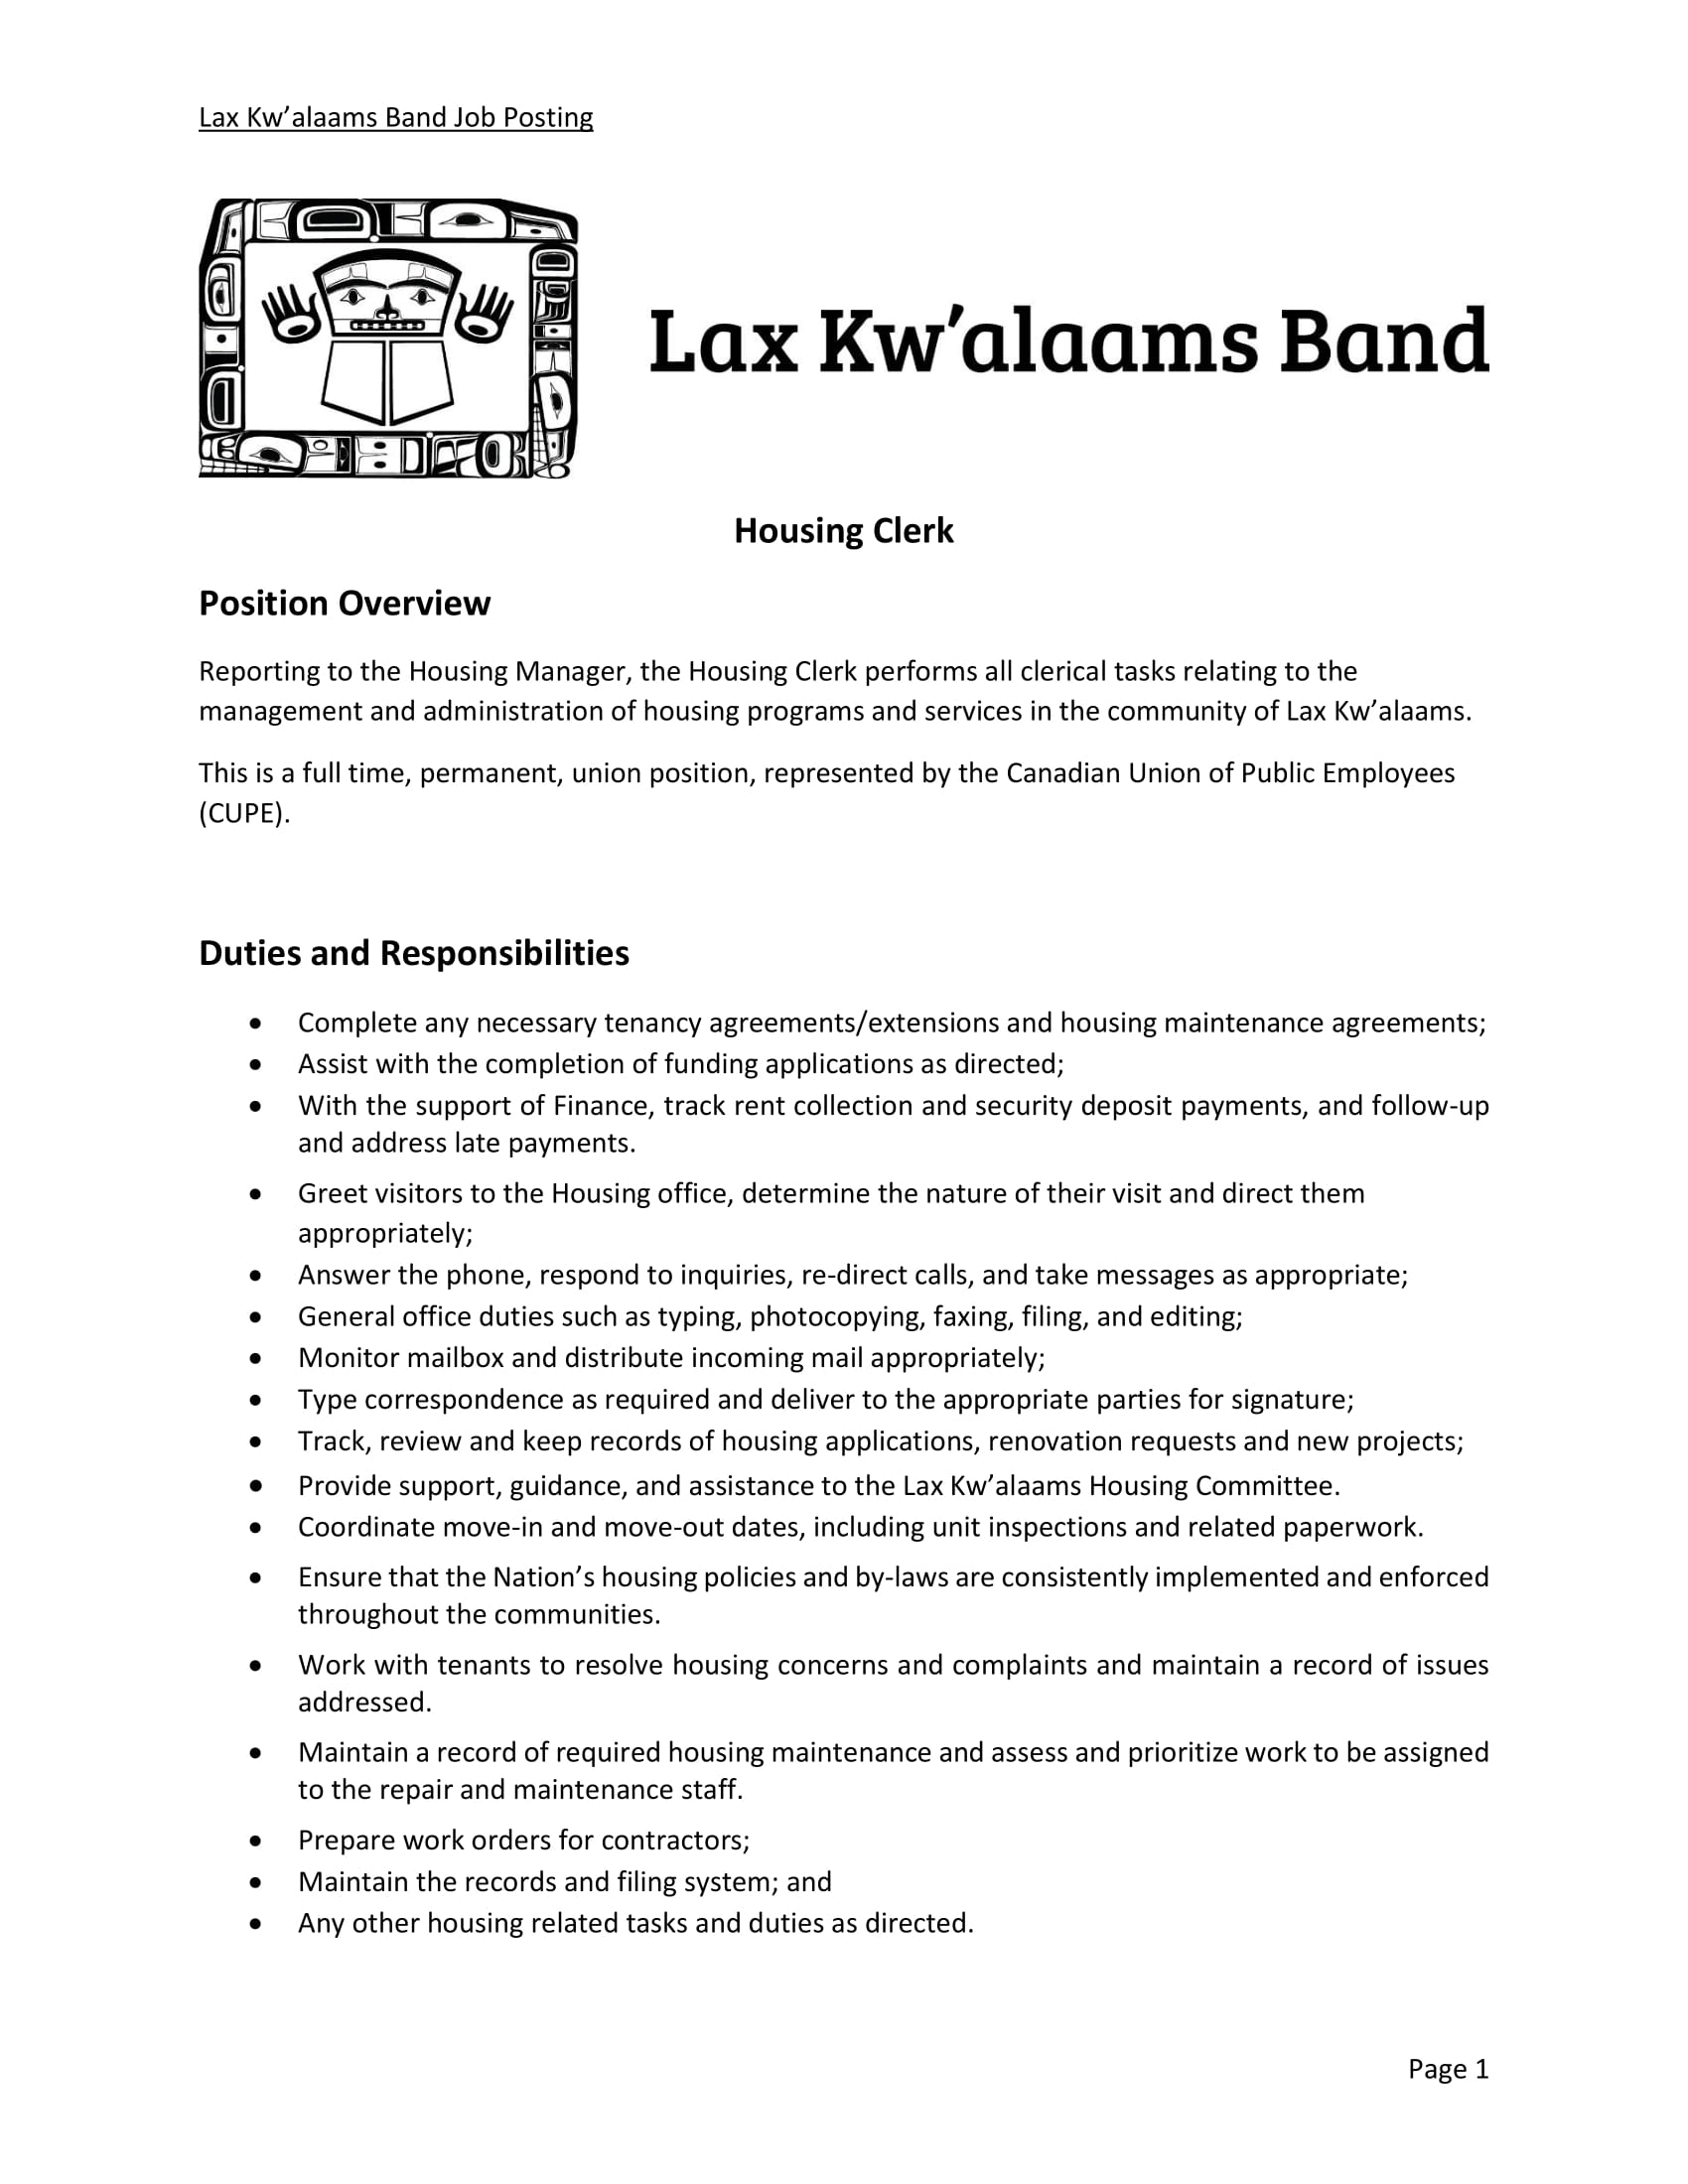 Housing Clerk – Job Posting – Lax Kw\'alaams Band